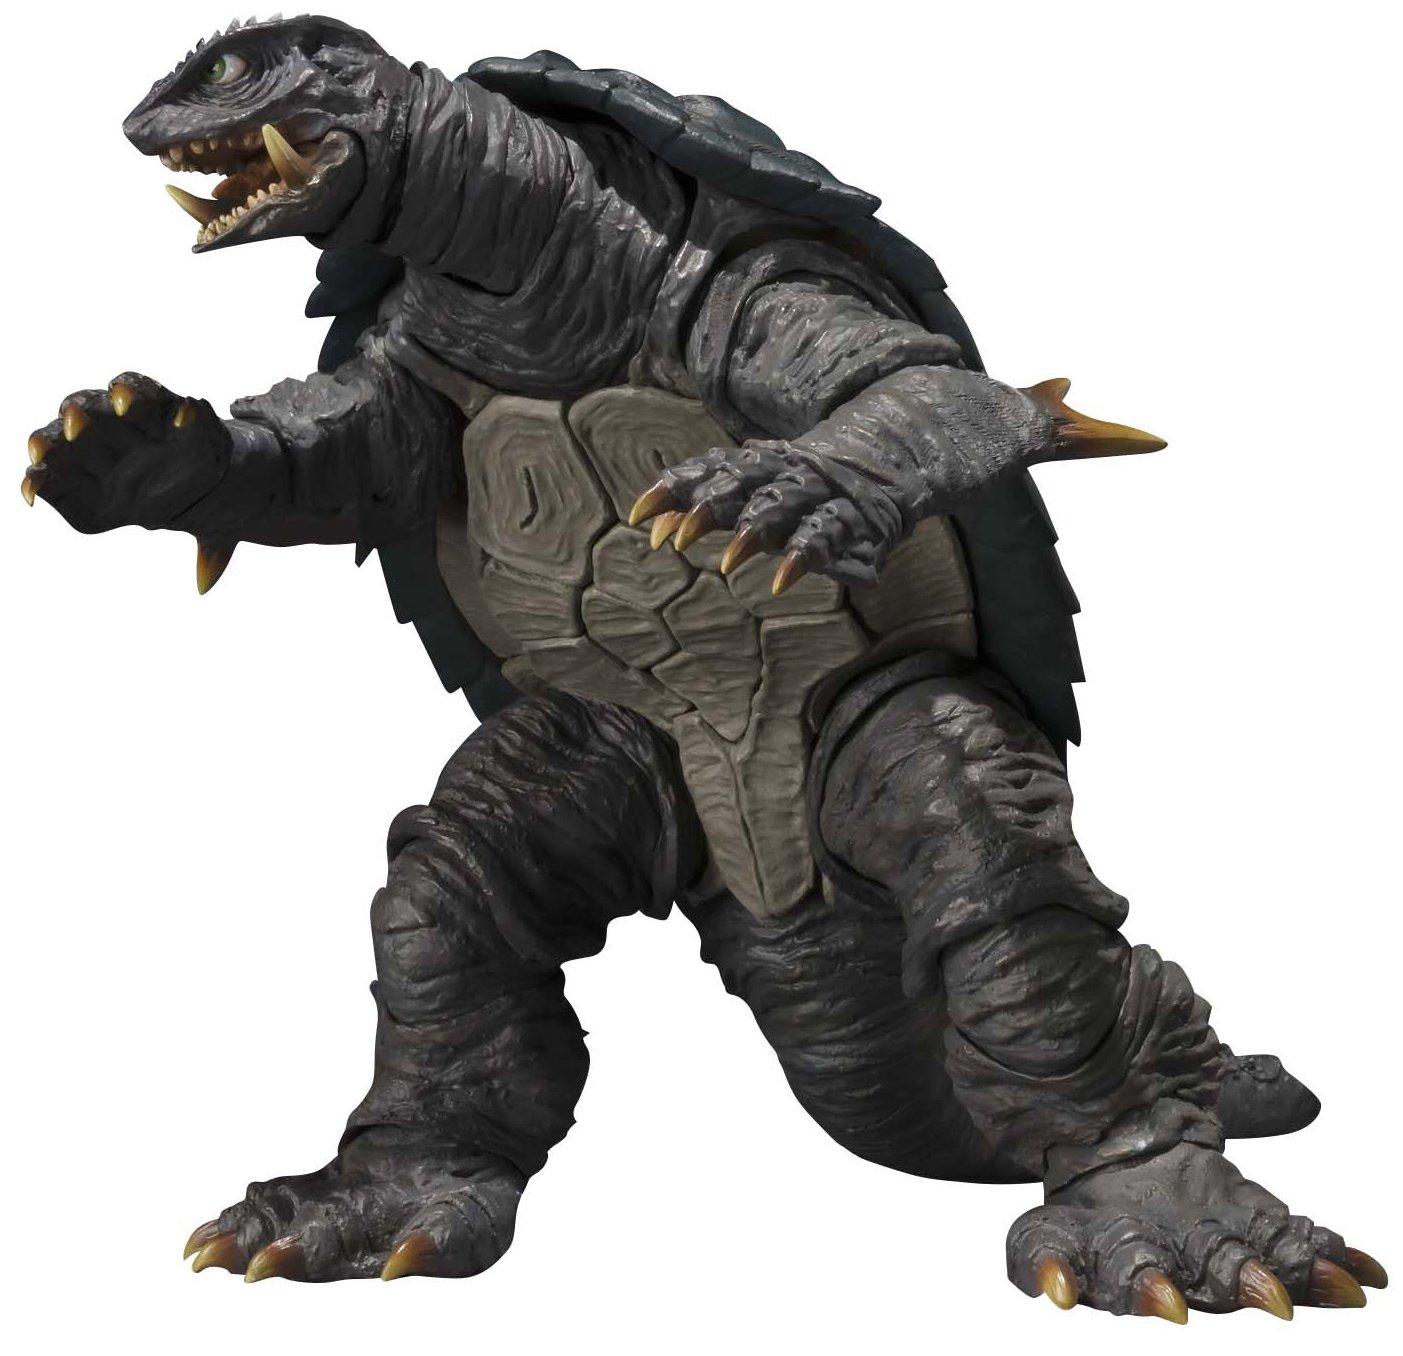 Godzilla Gamera 2 S.H. Monster Arts Action Figure